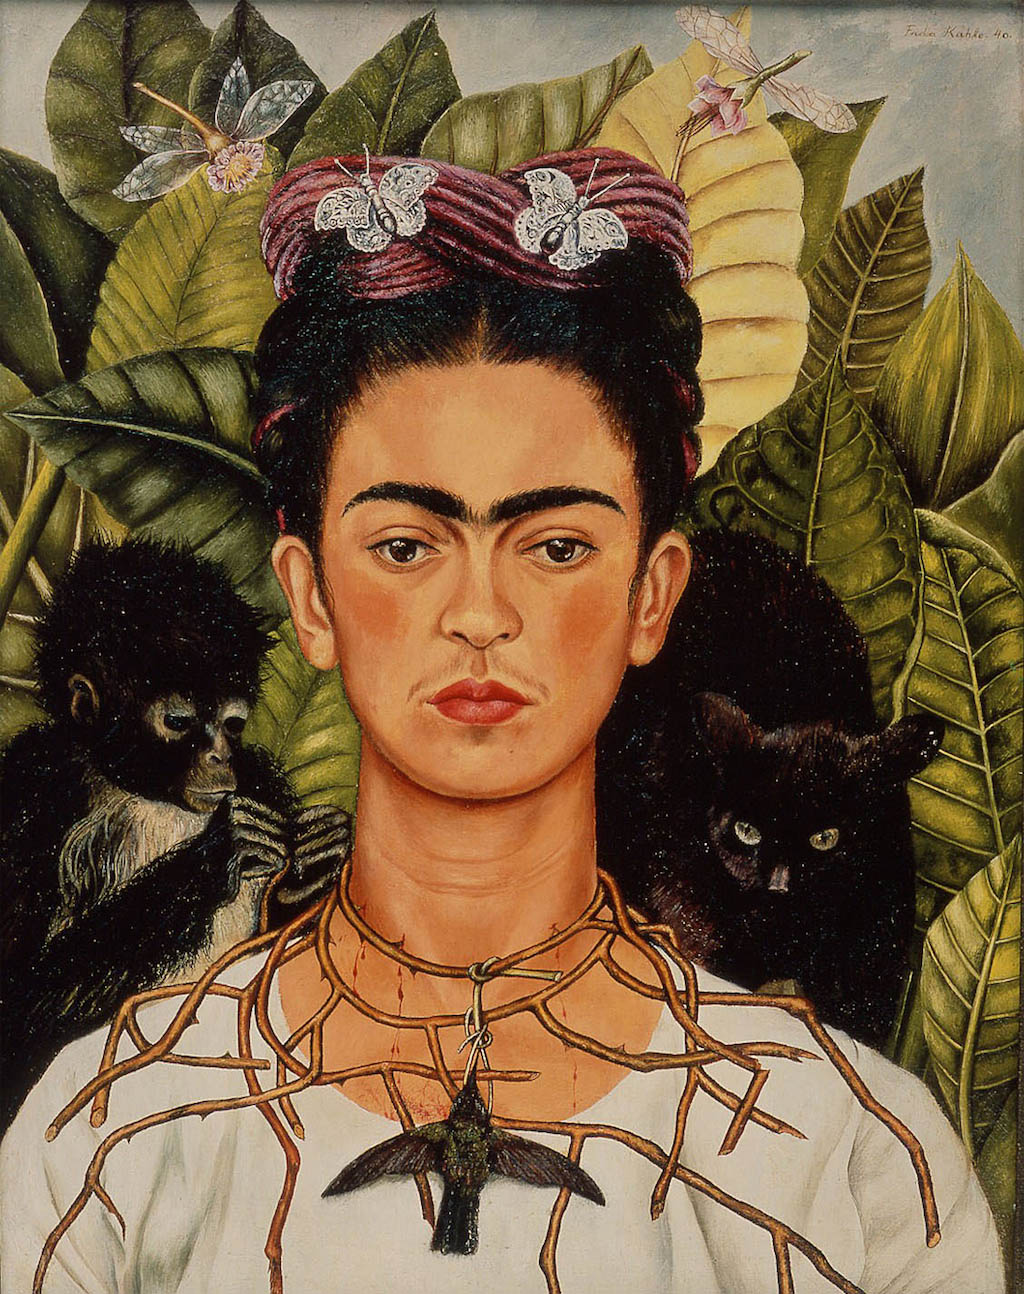 Frida Khalo<br> Autoretrato con un collar de espinas. 1940